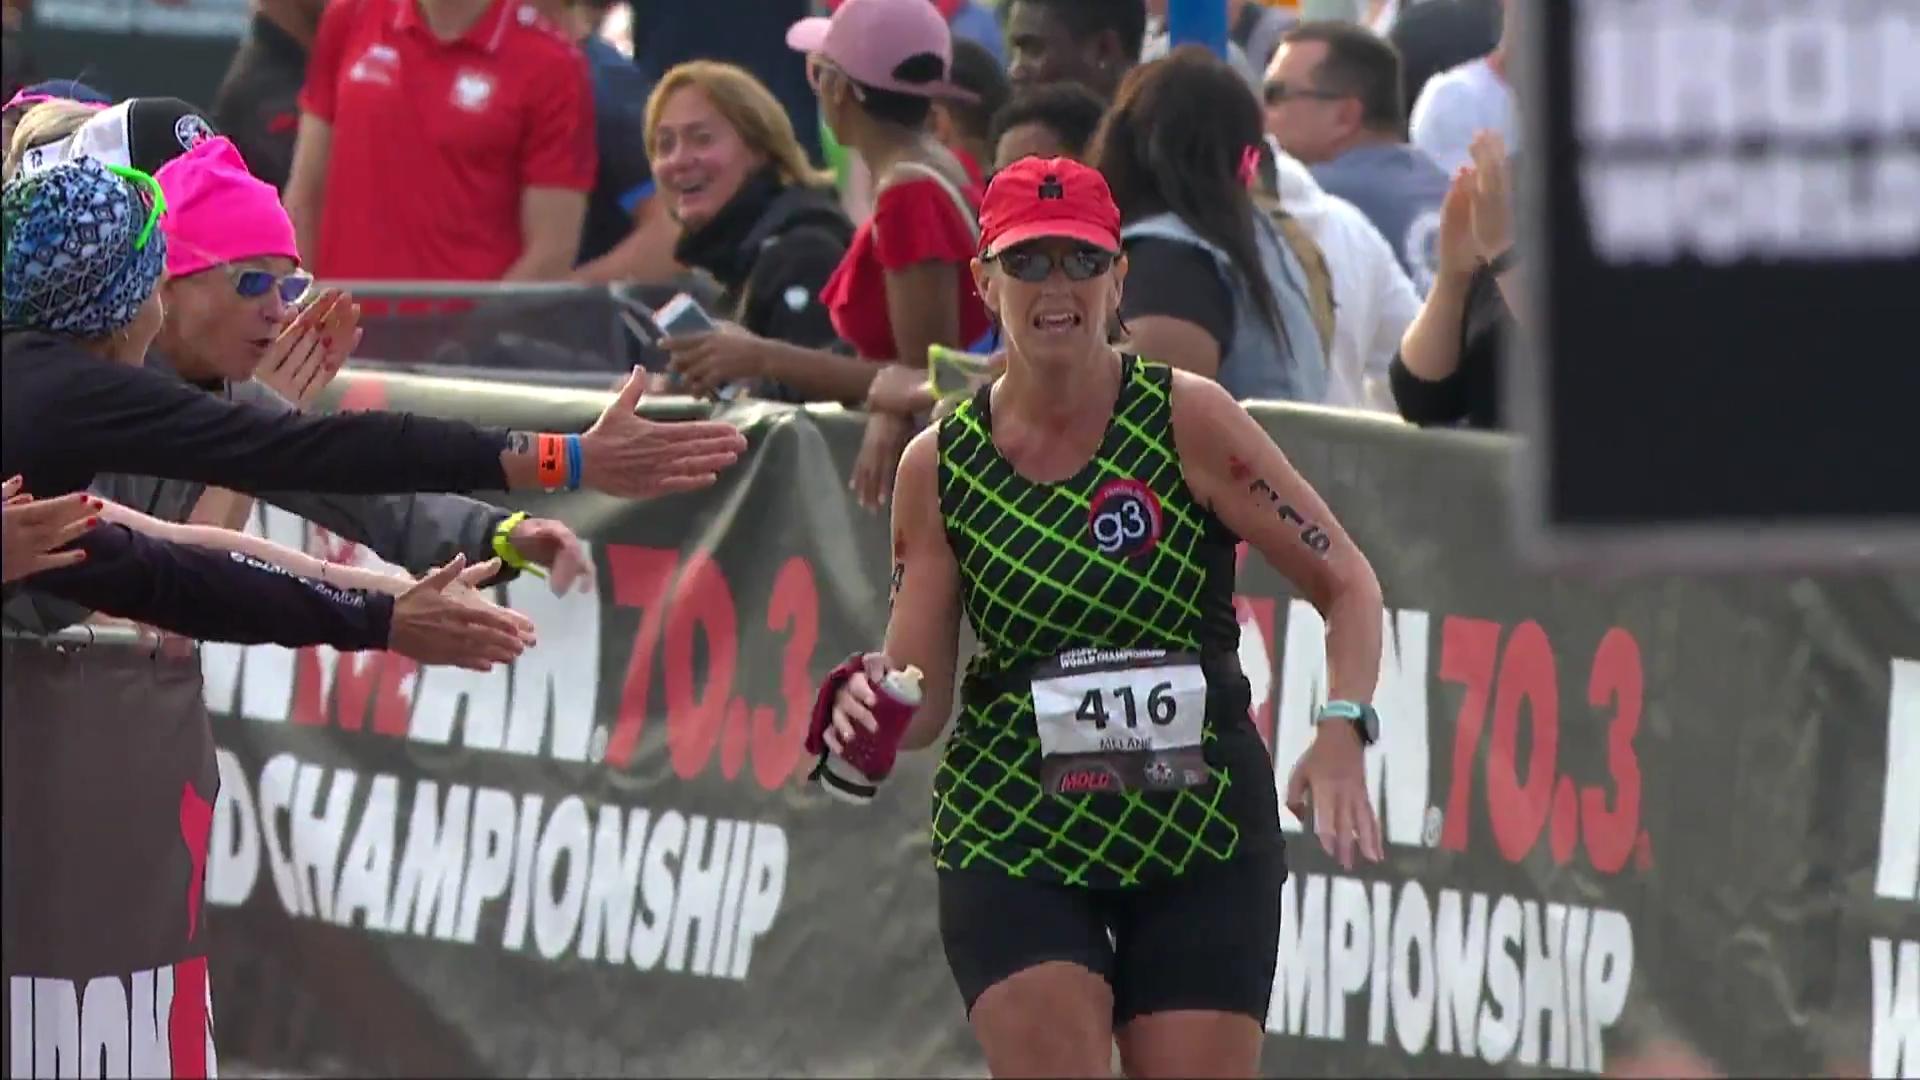 Melanie Cameron – Ironman World Championship 2018 12